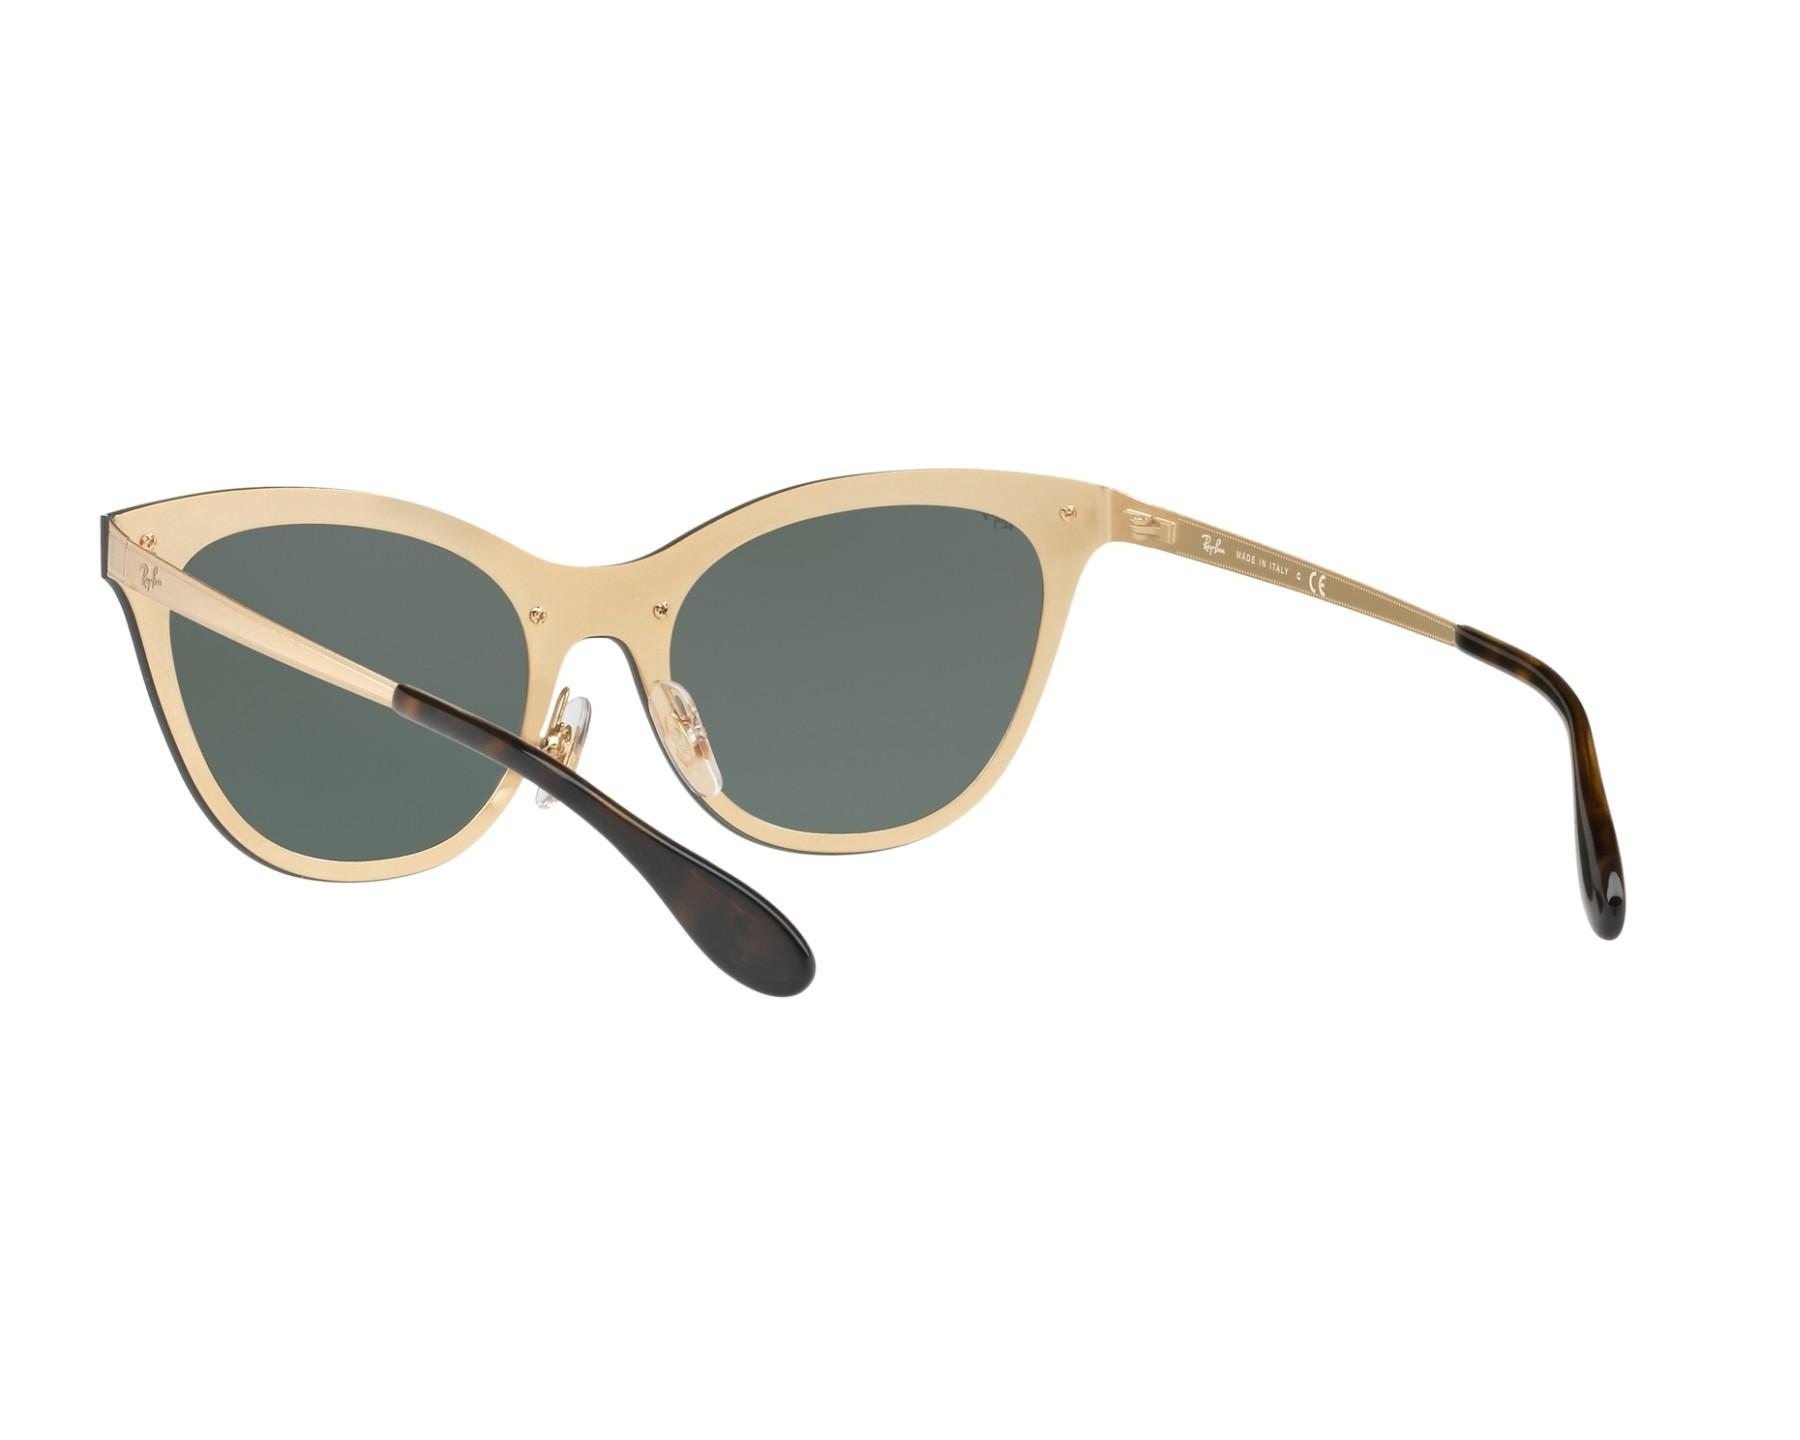 1be58c0f8a Ray-Ban Sunglasses RB-3580-N 043 71